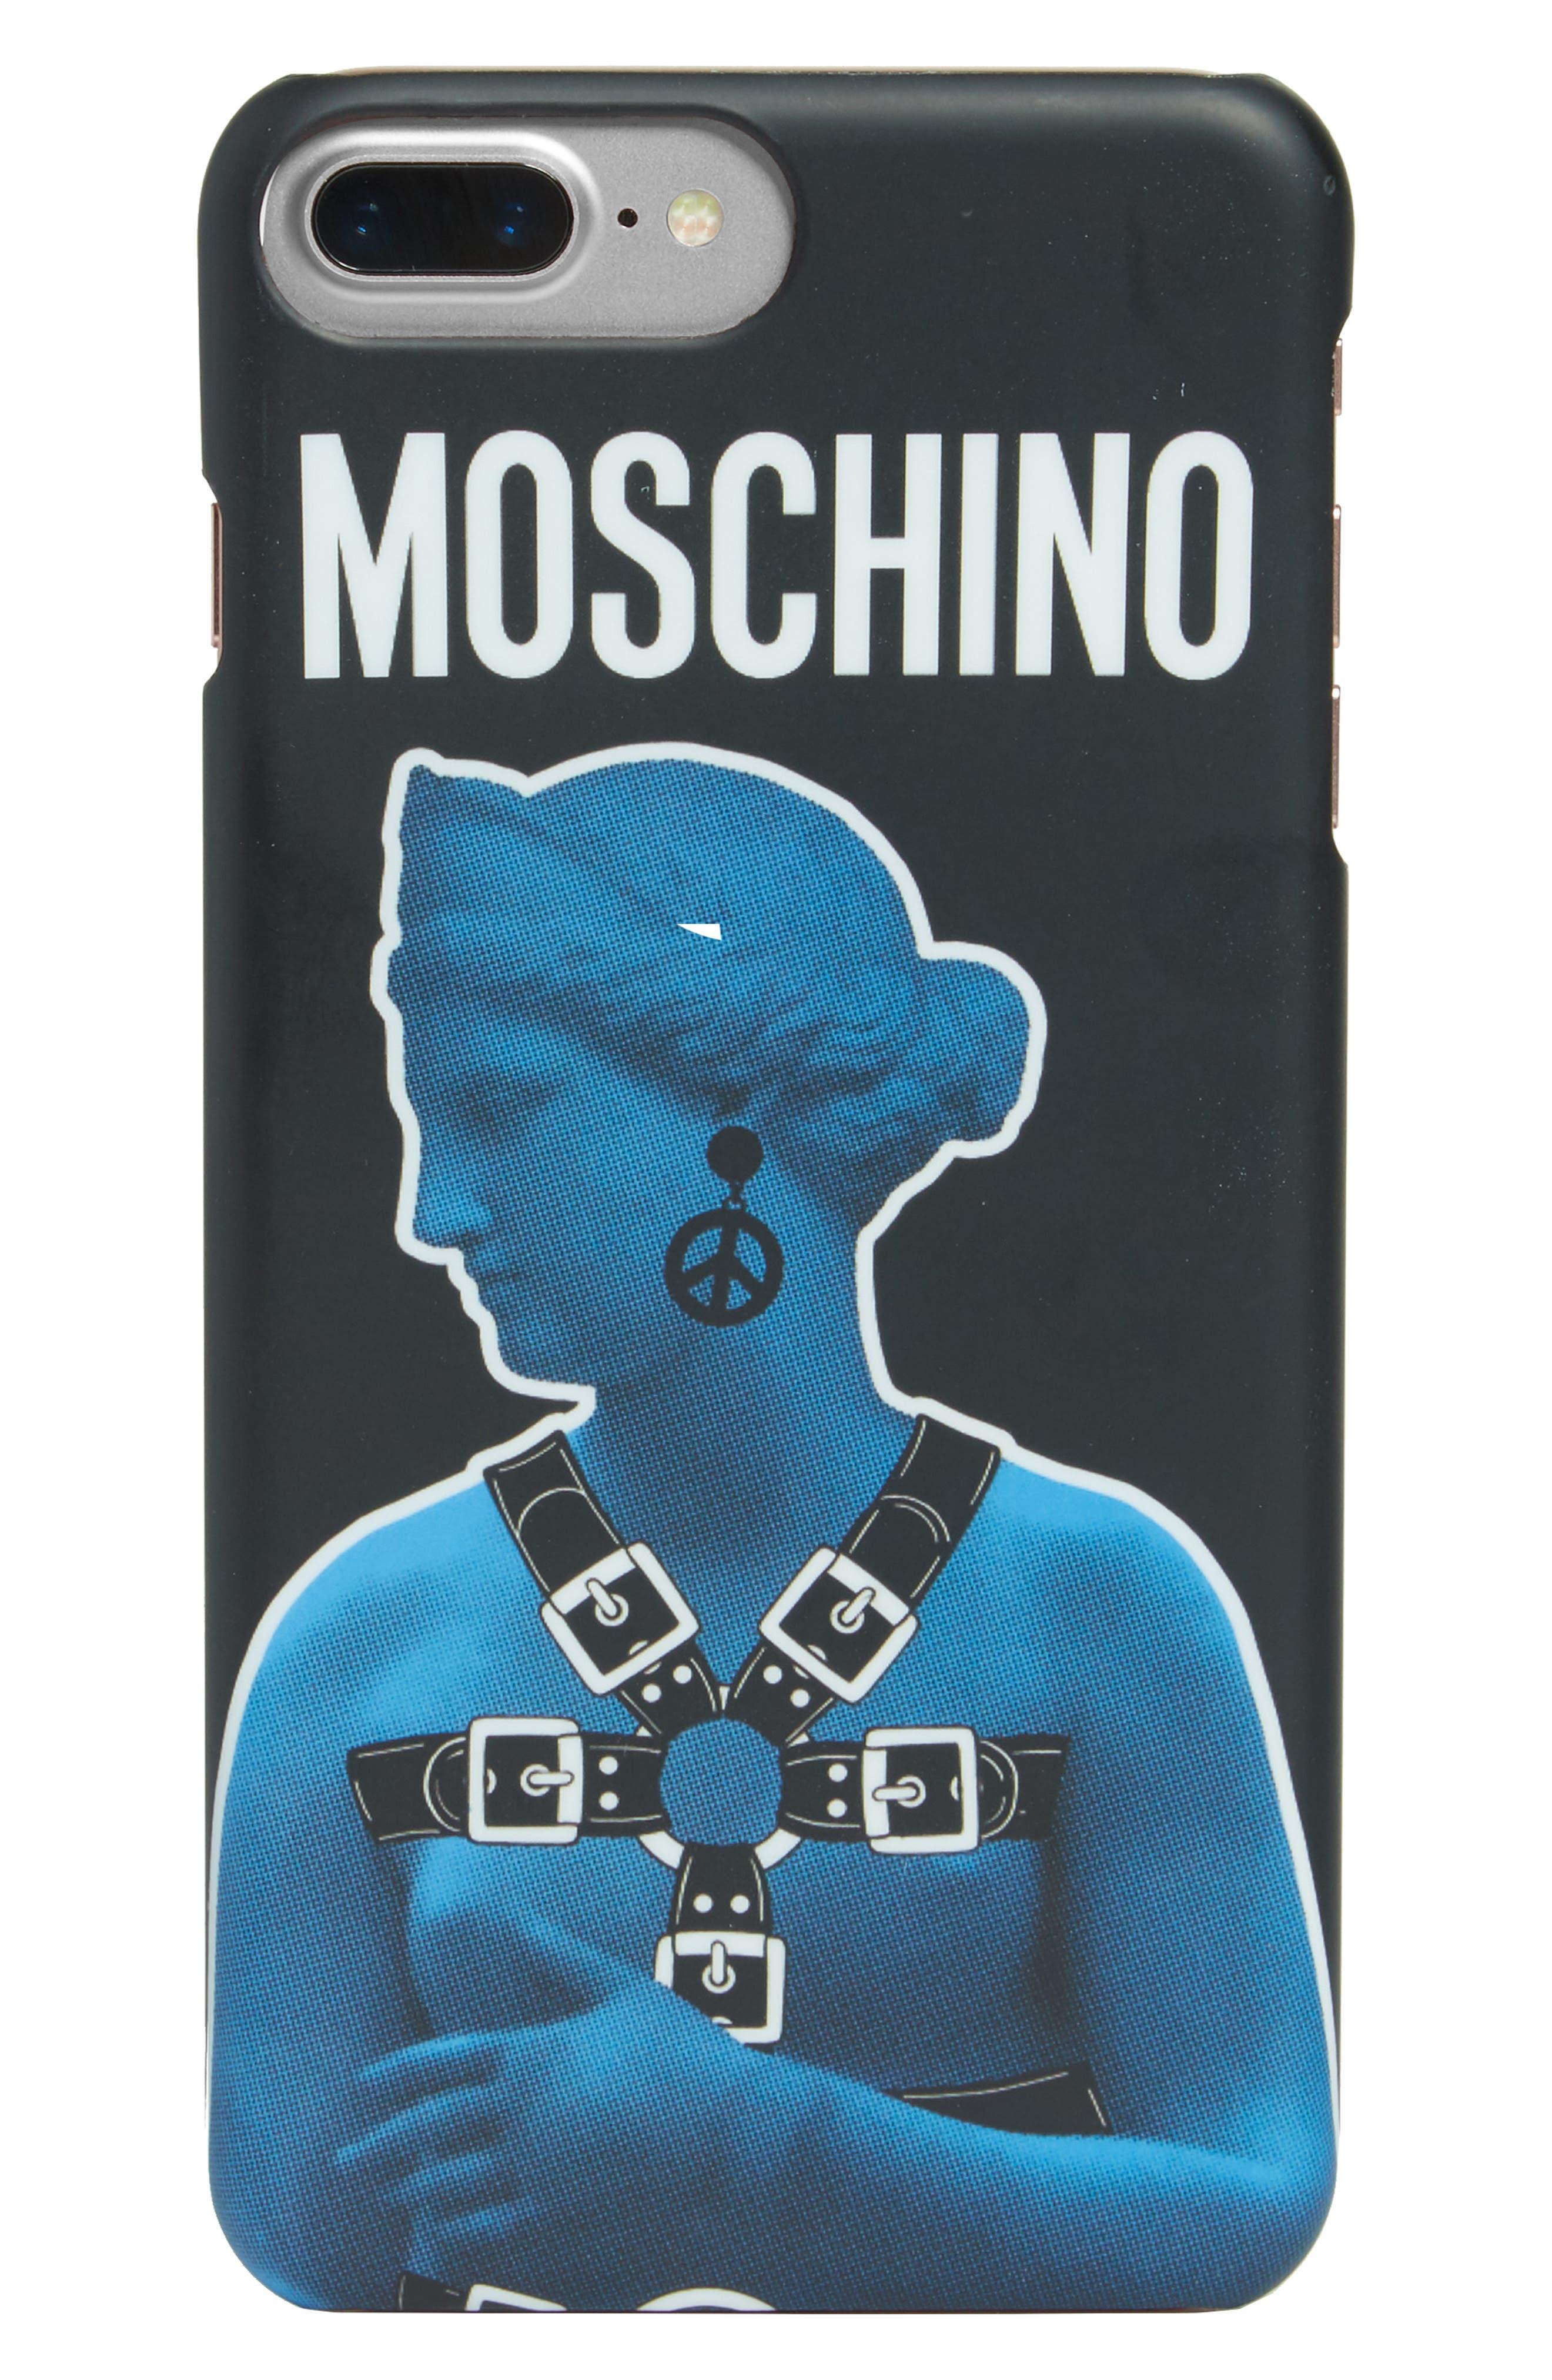 Moschino Statue Graphic iPhone 6/6s/7 Case